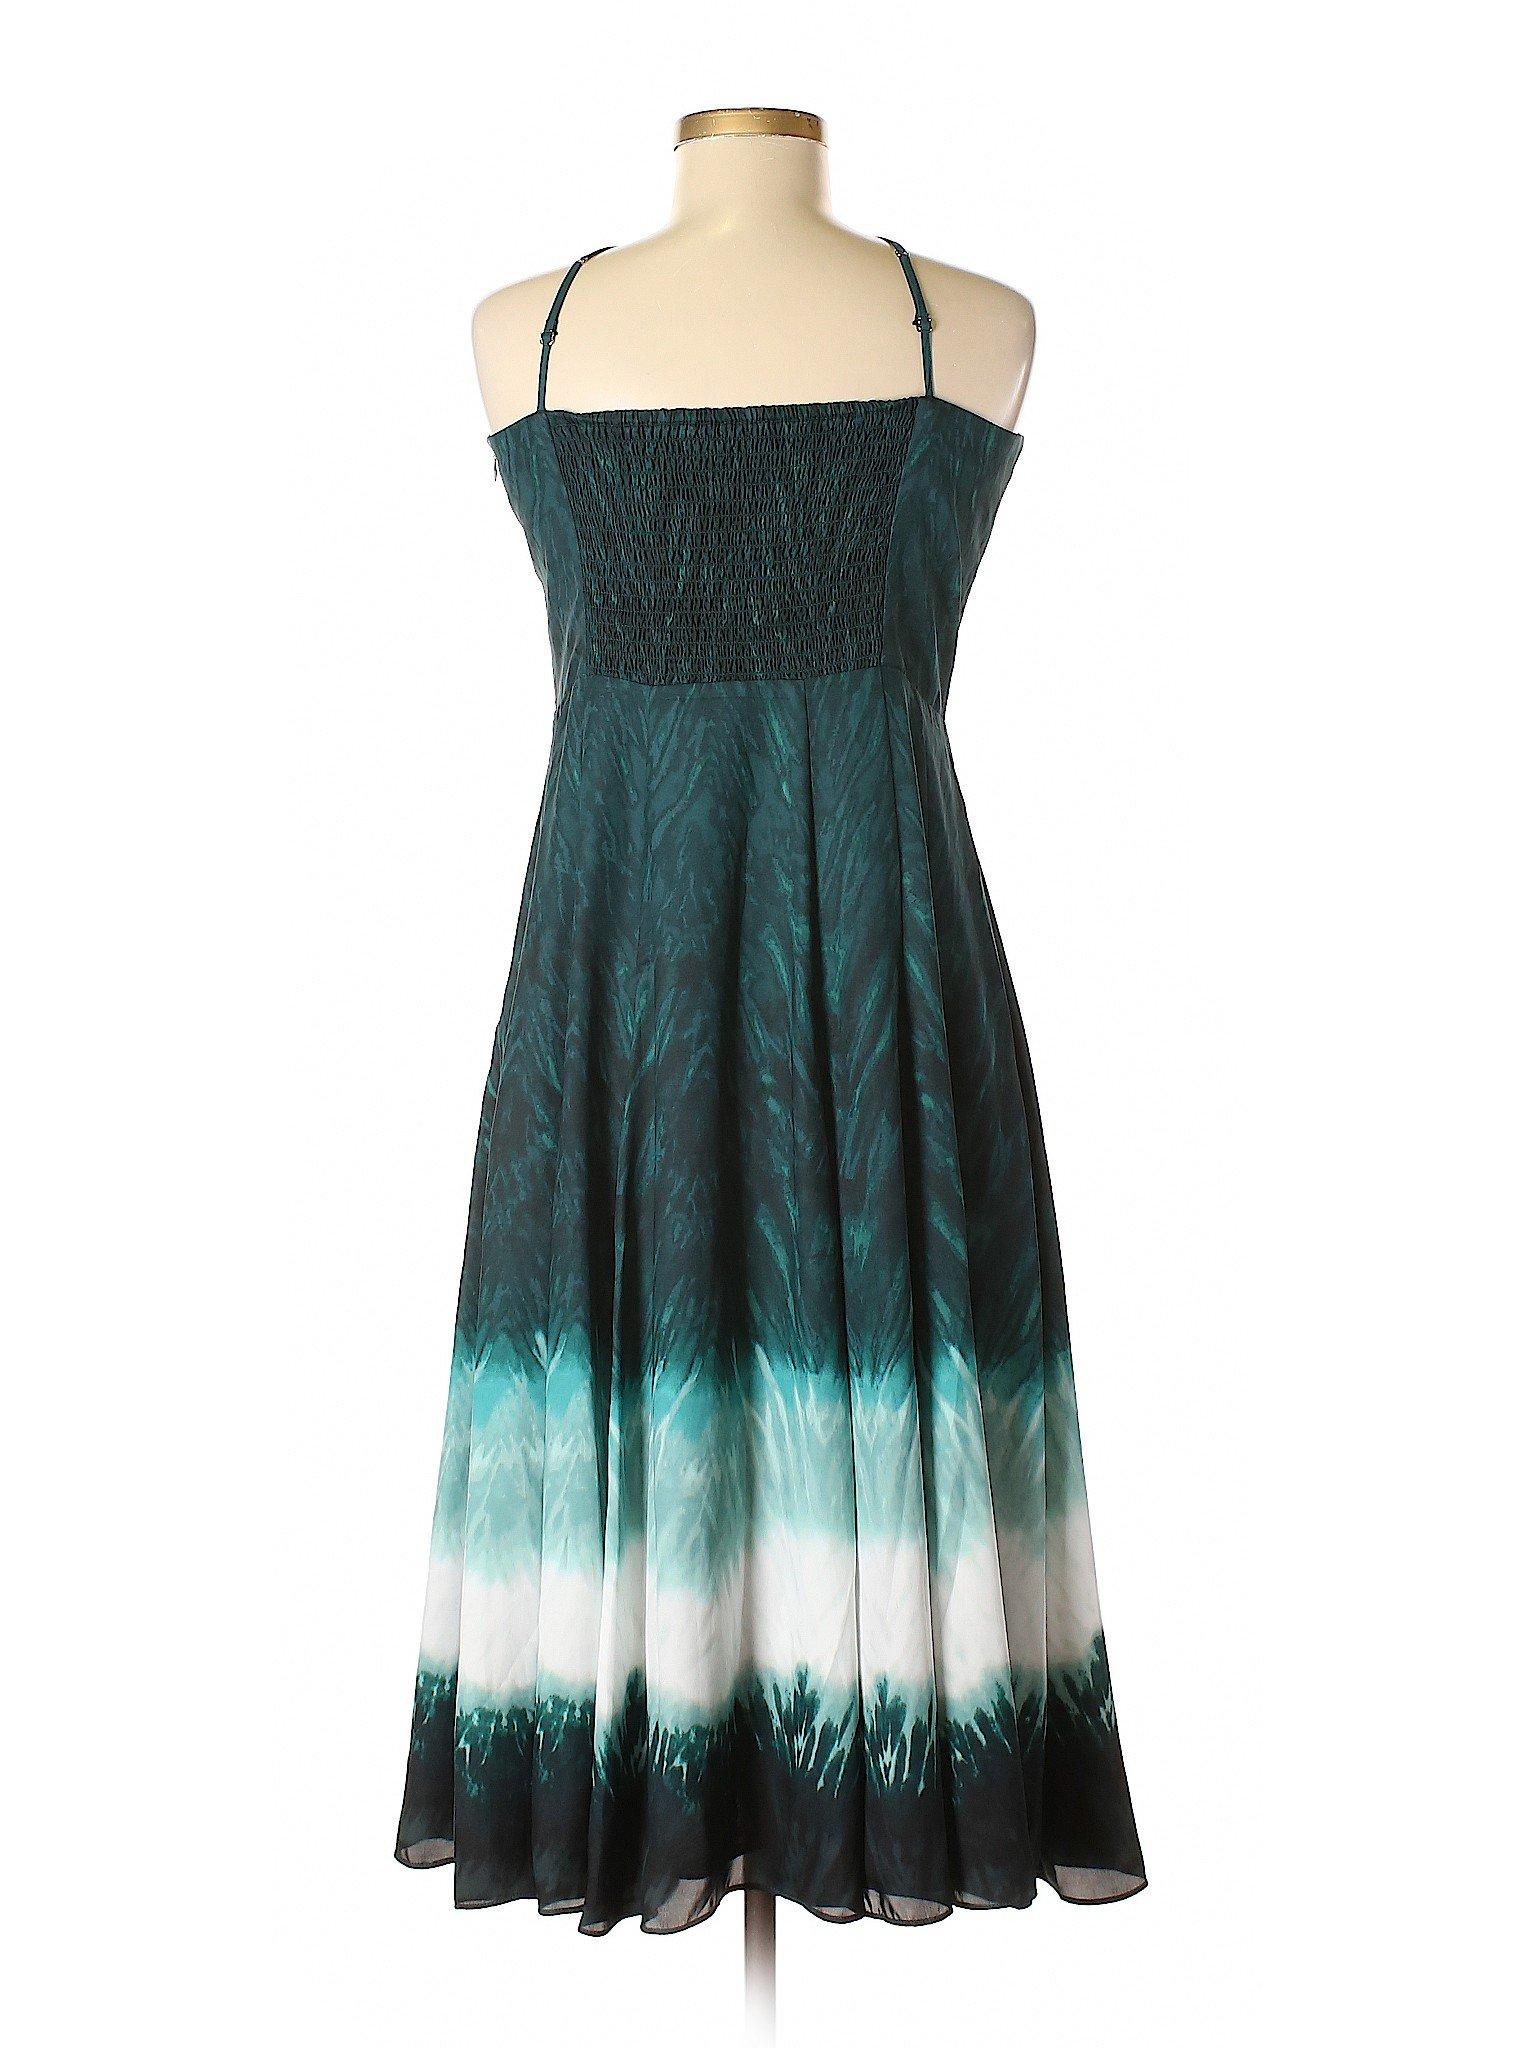 Black White Casual Market Dress House Selling vRw7Uq